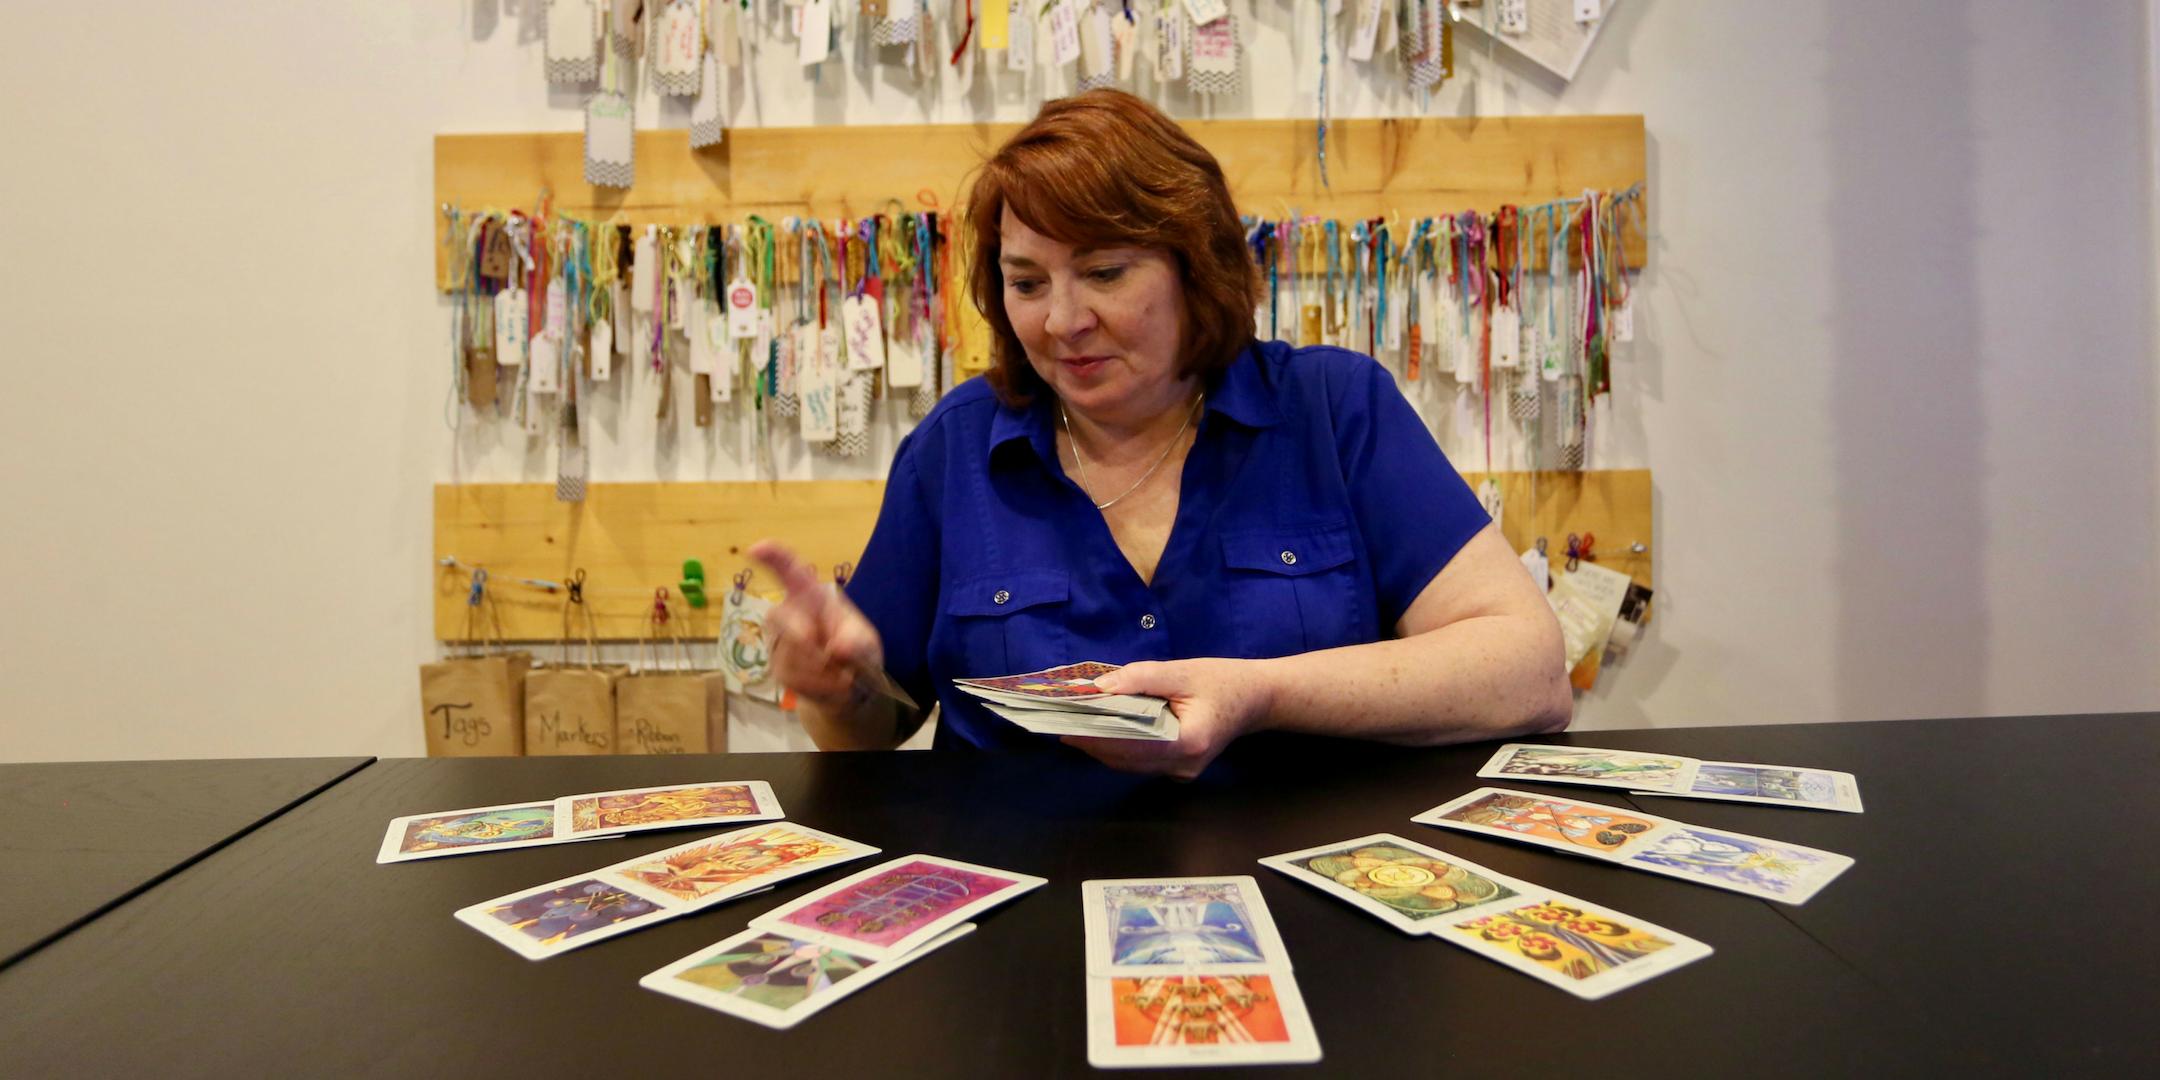 Learn the Tarot: Astrology & Tarot